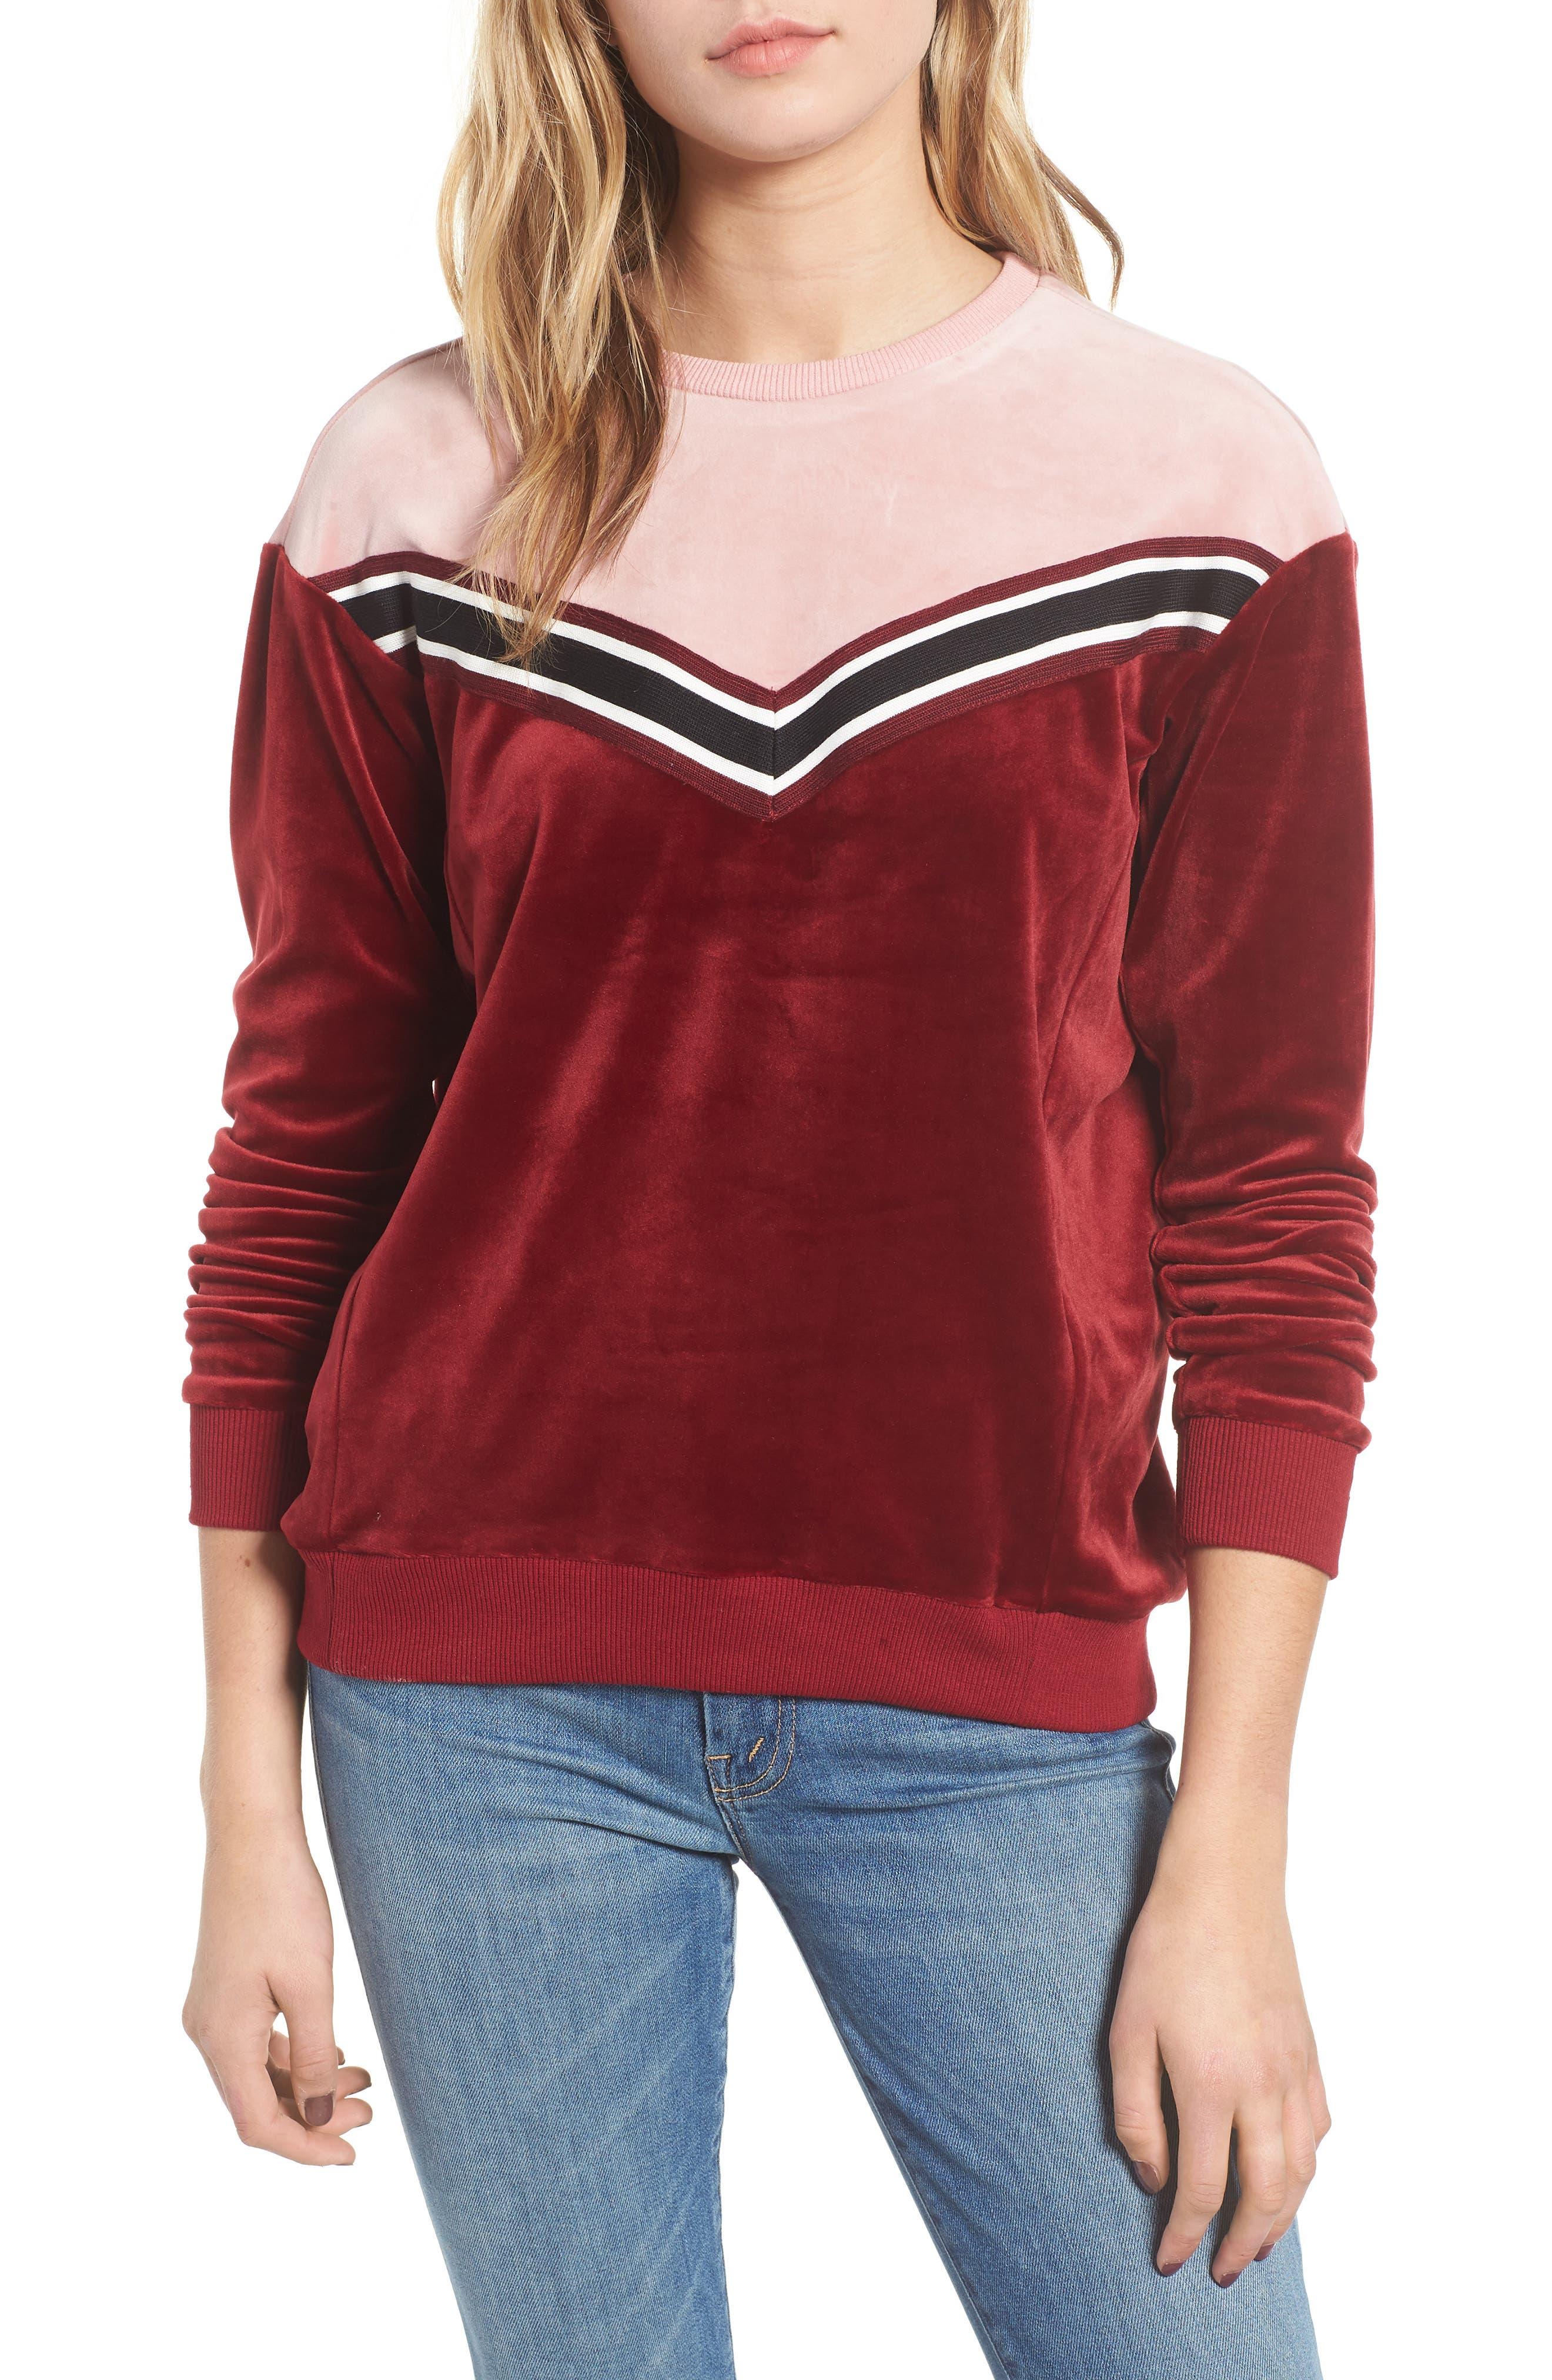 HEARTLOOM Kris Velour Sweatshirt in Merlot